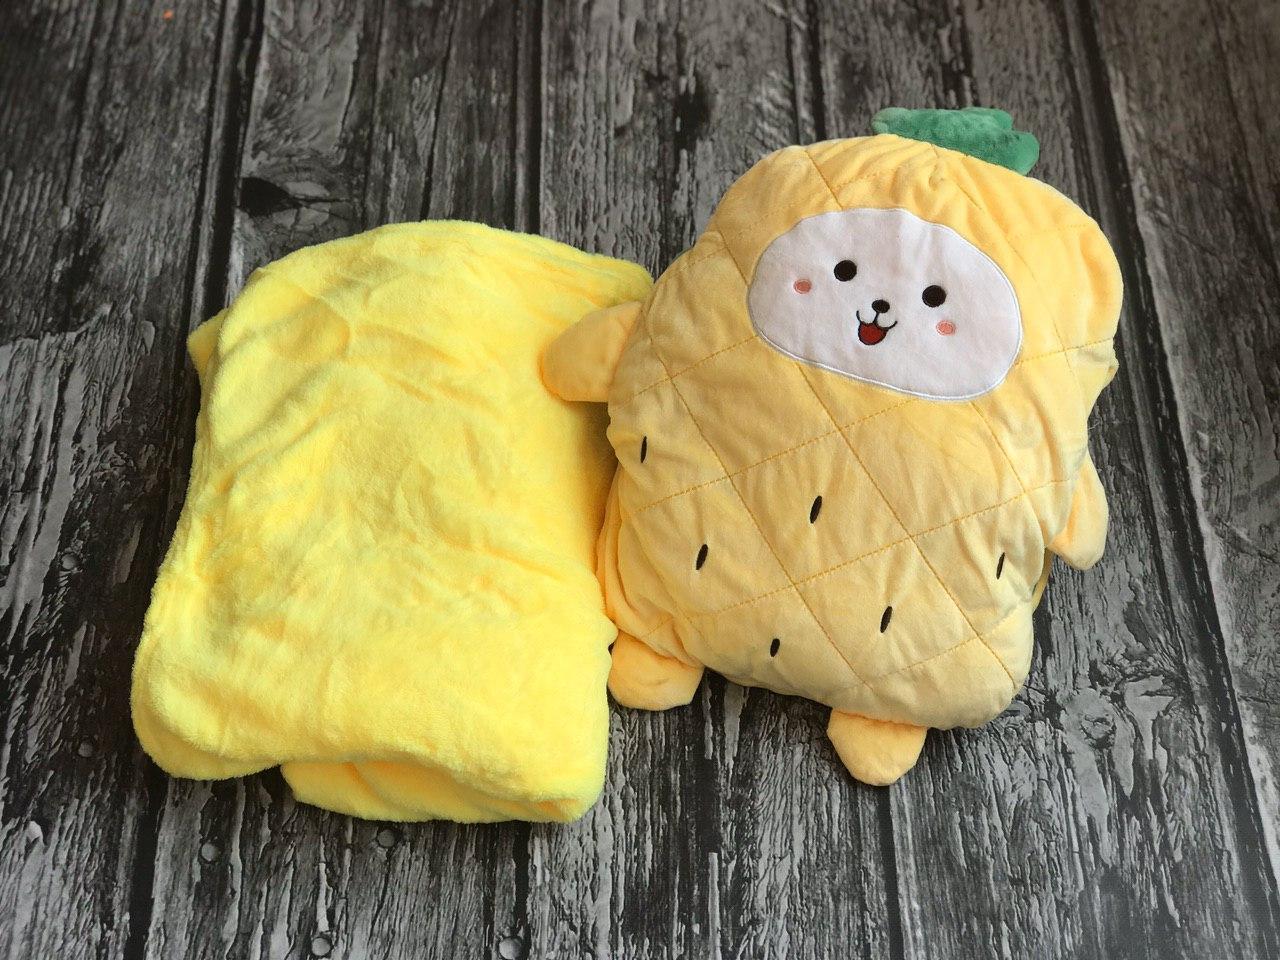 Іграшка плед жовтий